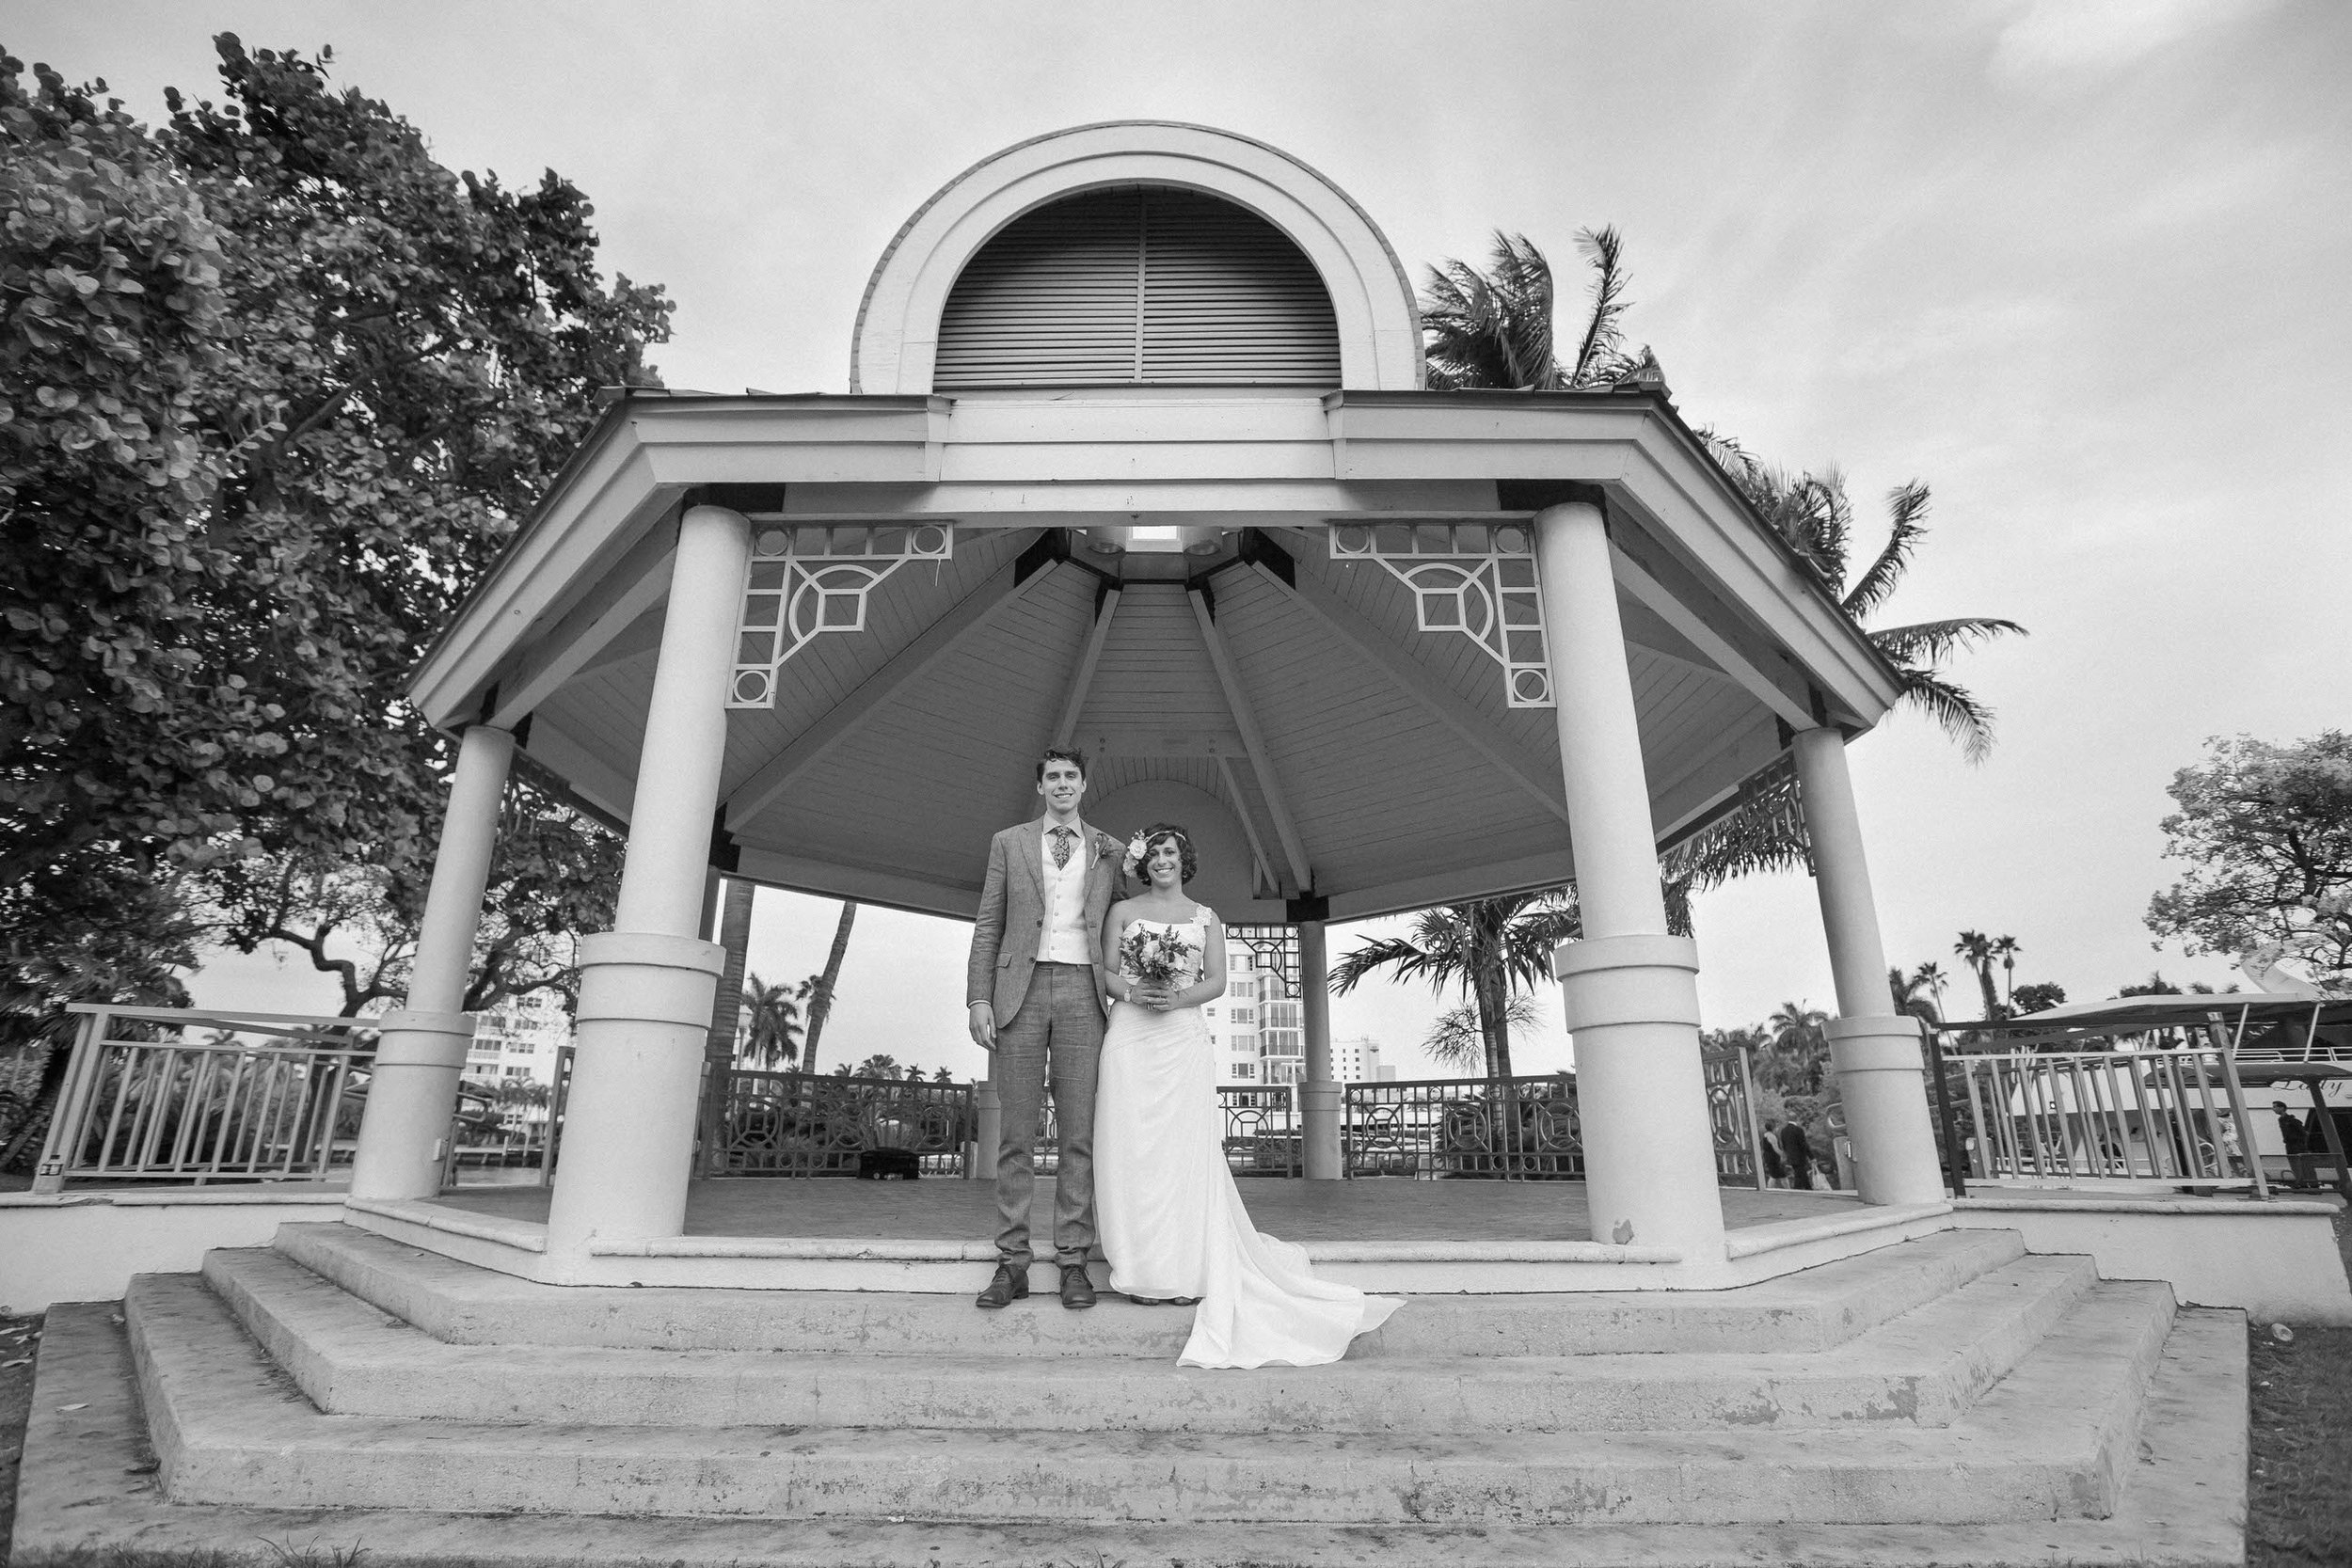 bride-groom-veterans-park-black-and-white-portrait-beautiful.jpg